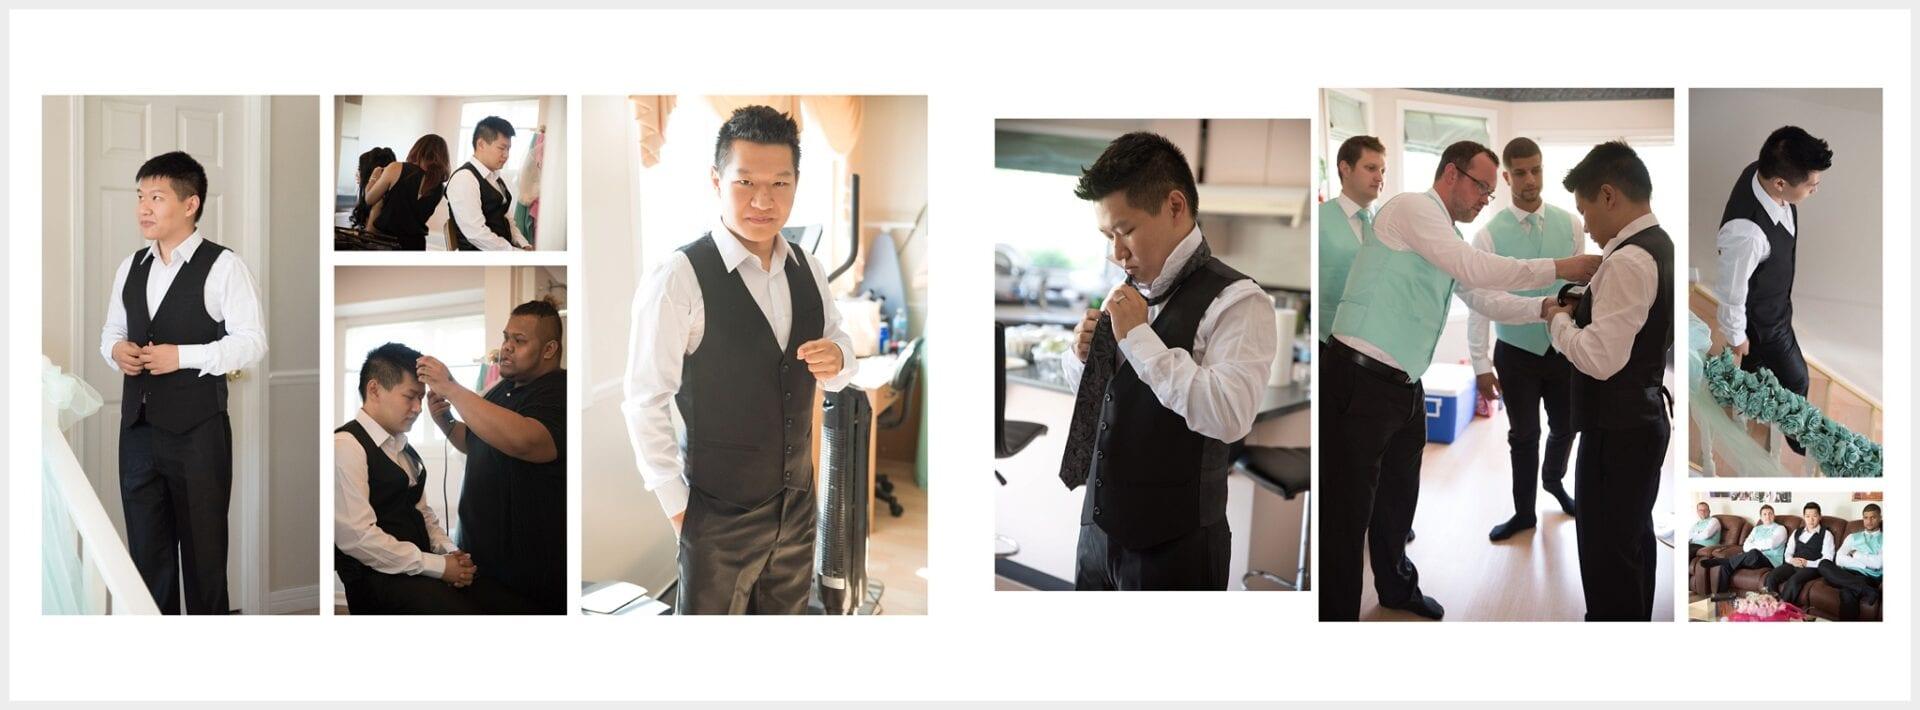 Cambodian Wedding Edmonton Calgary Photo Album-_0001